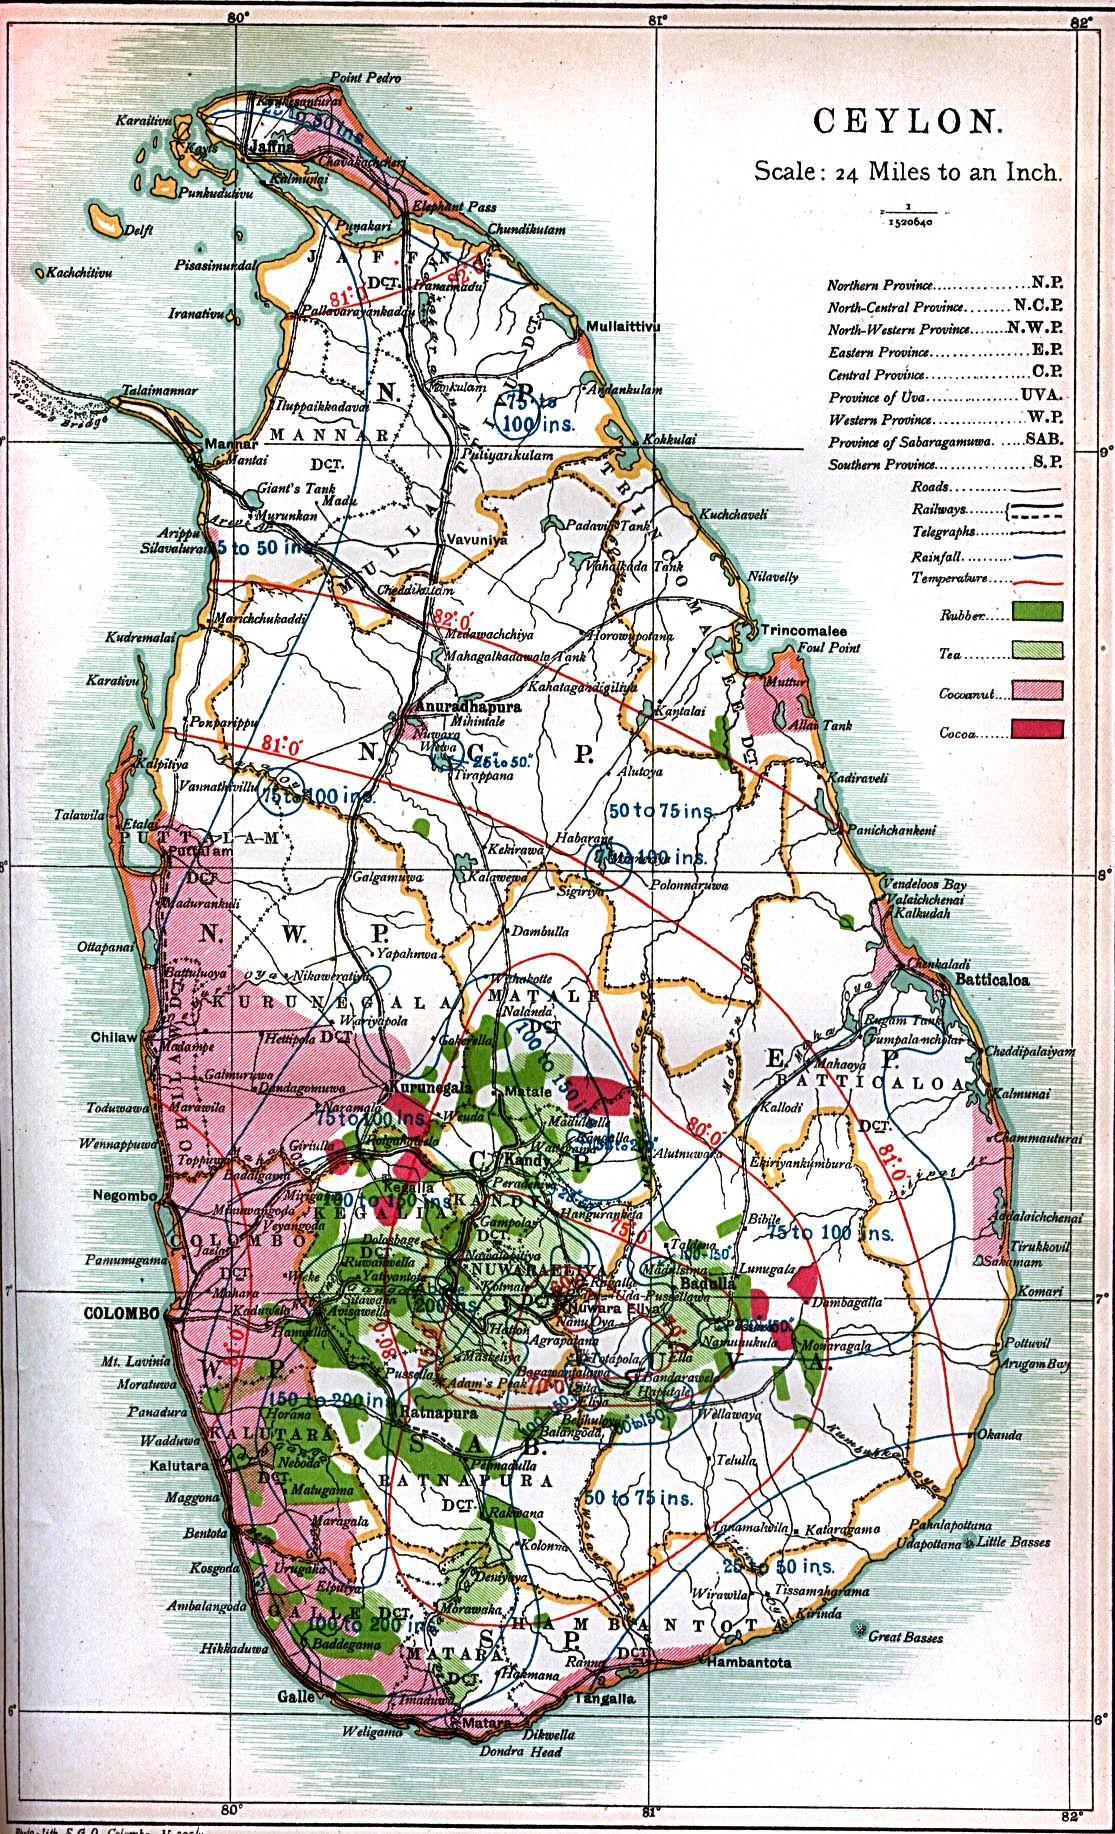 Map of Ceylon